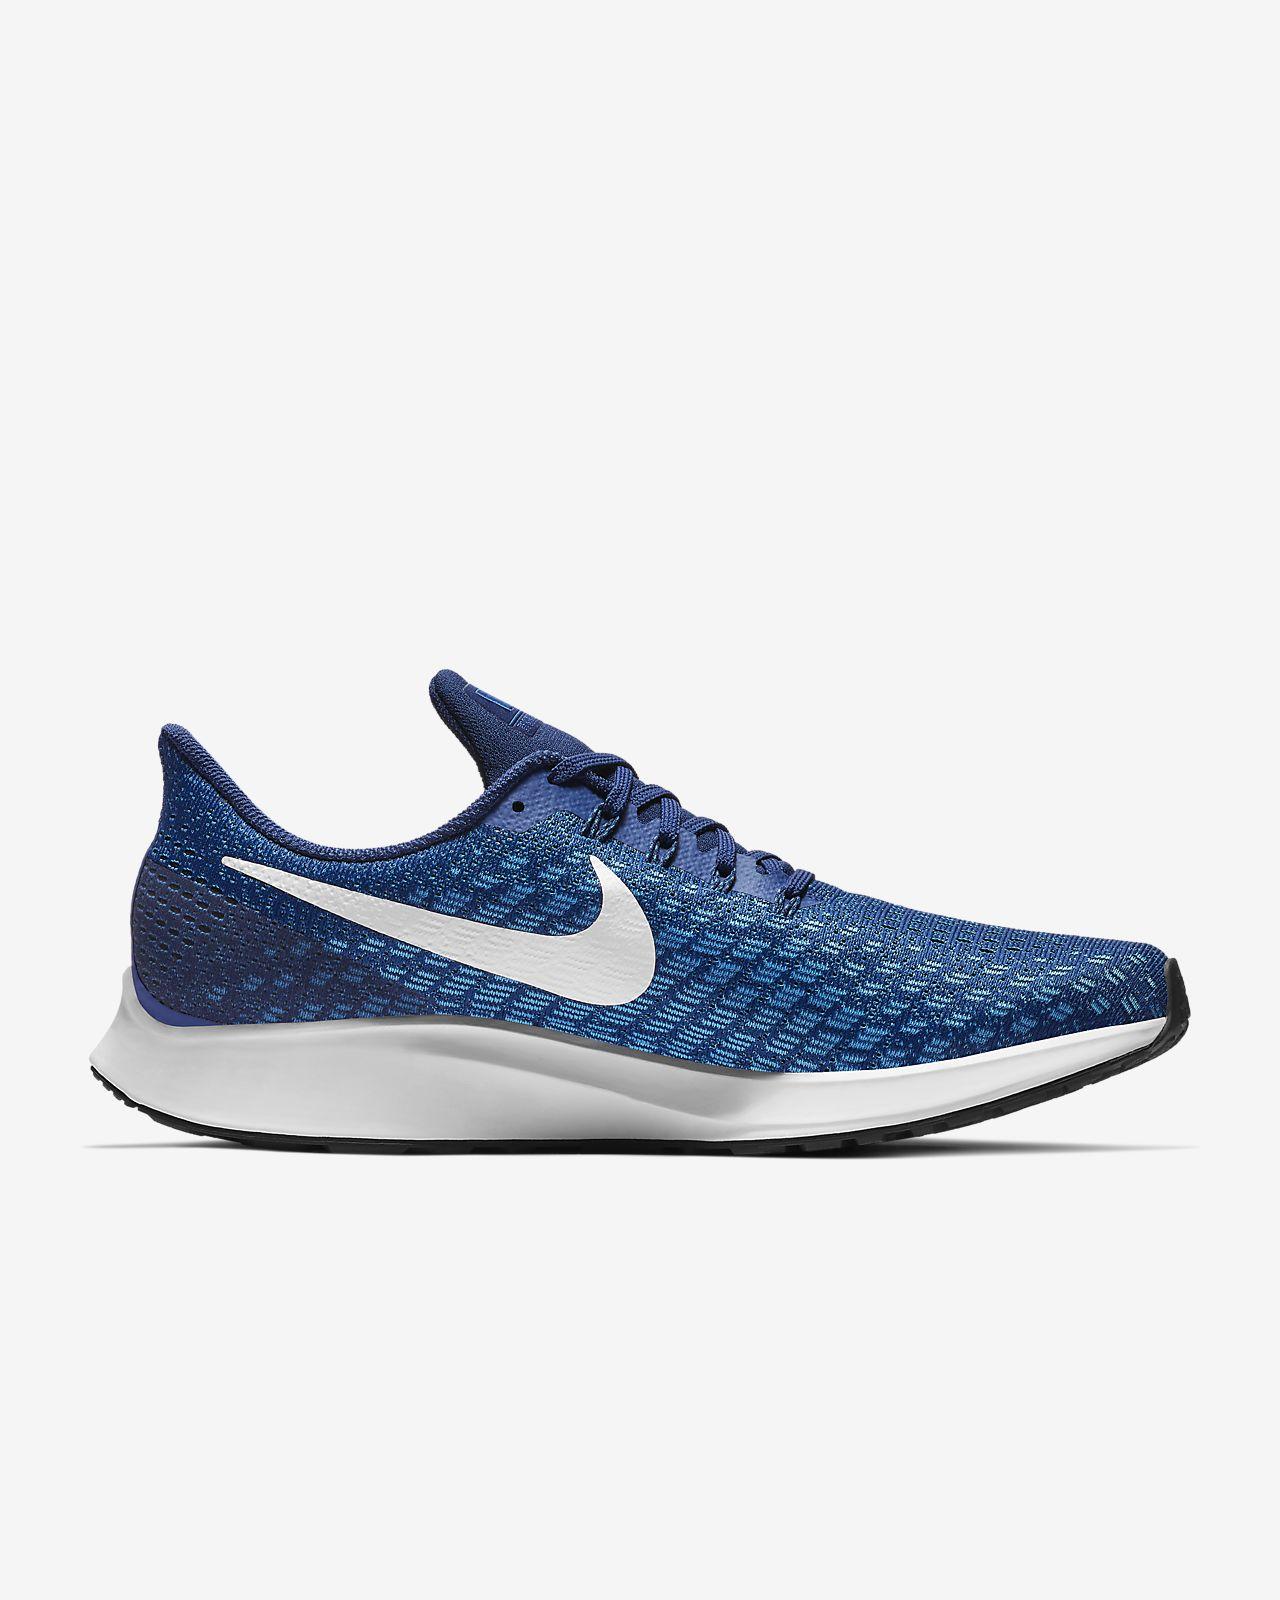 0870fff7a6ed5 Nike Air Zoom Pegasus 35 Men s Running Shoe. Nike.com ID